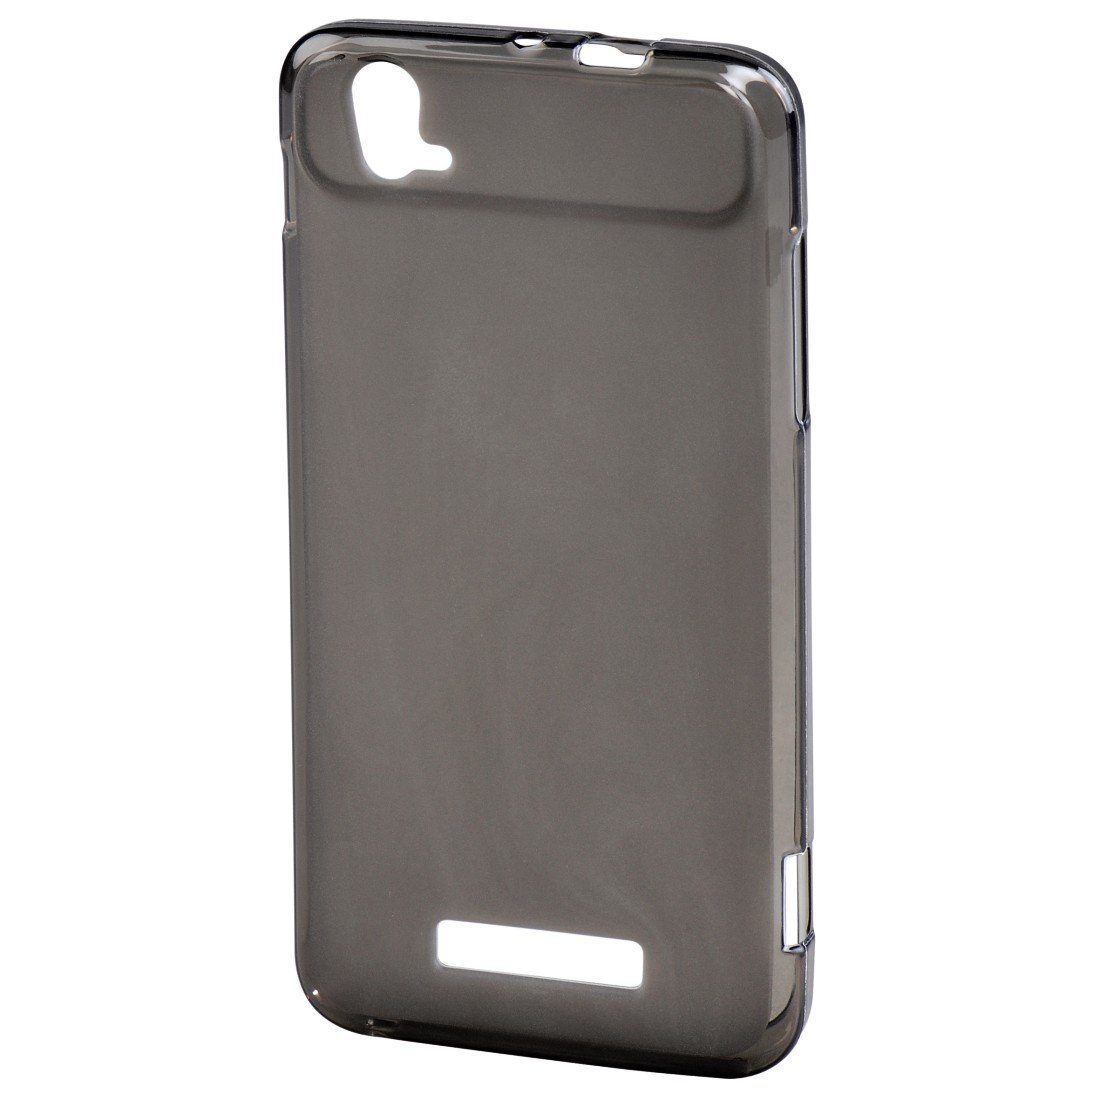 Hama Handy-Cover Crystal für ZTE Grand S Flex, Grau